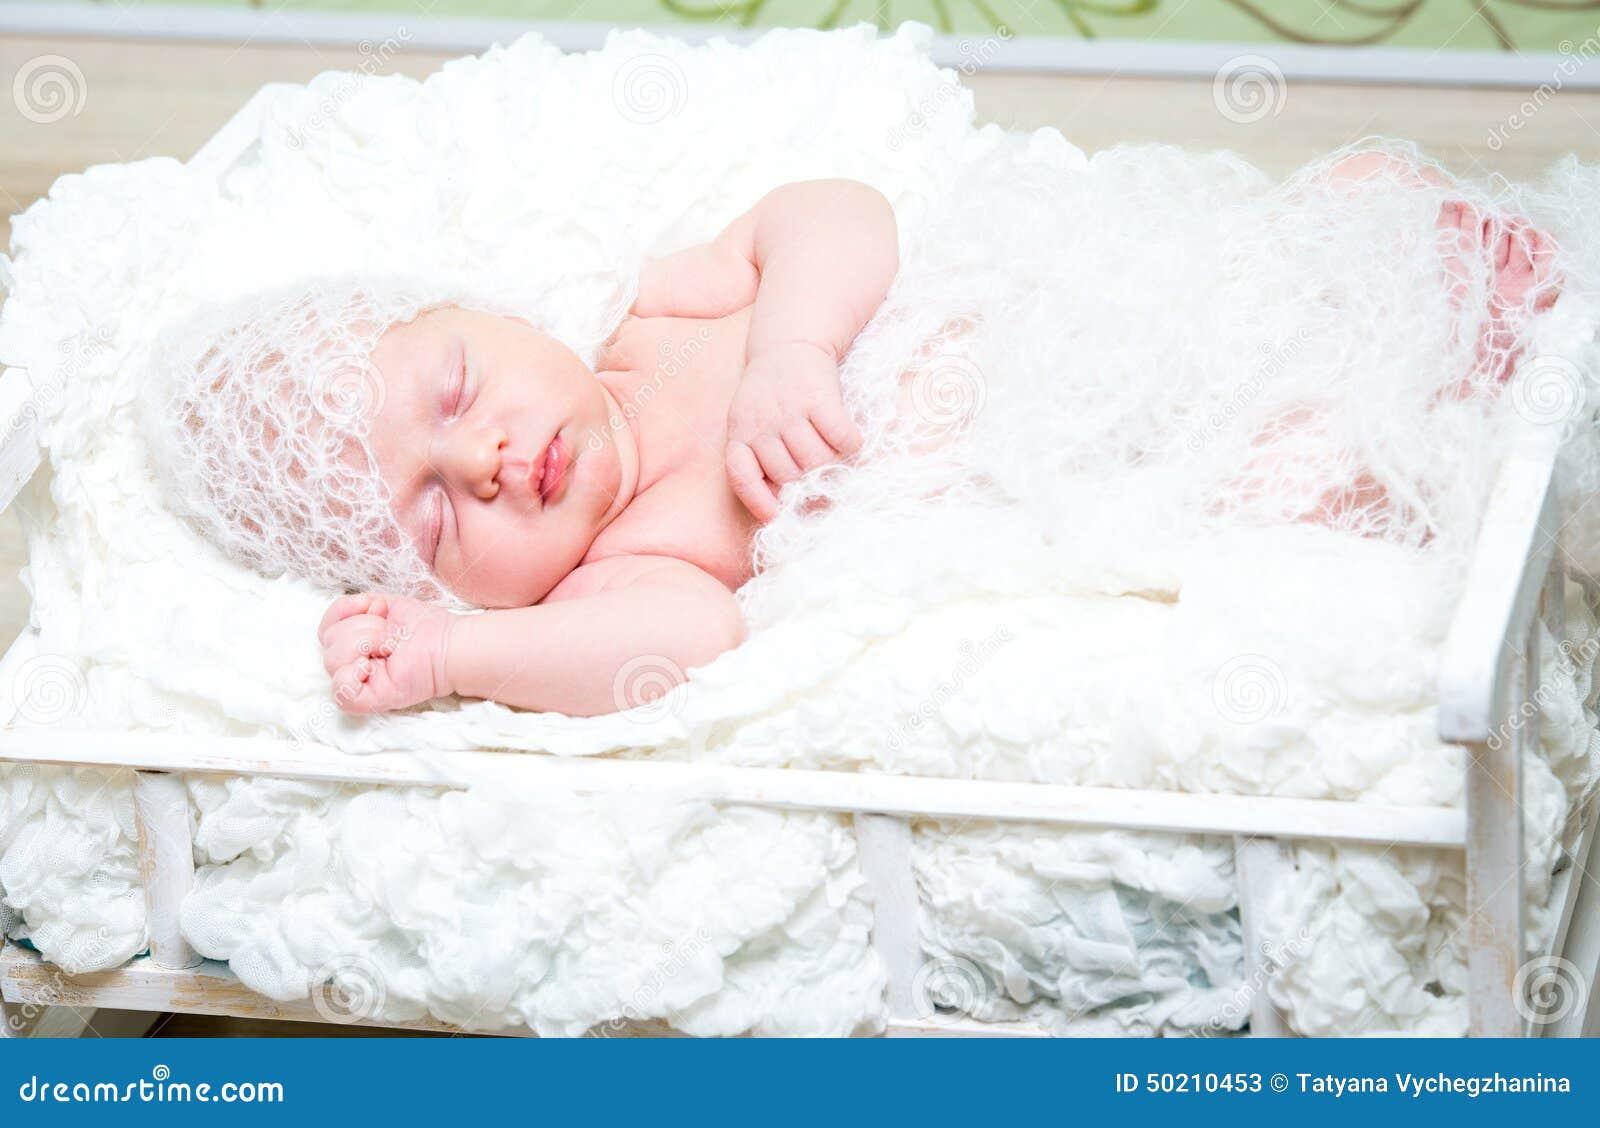 Beautiful Newborn Baby Boy Sleeping In Knitted Cap Stock Image ... 1f9d3397662